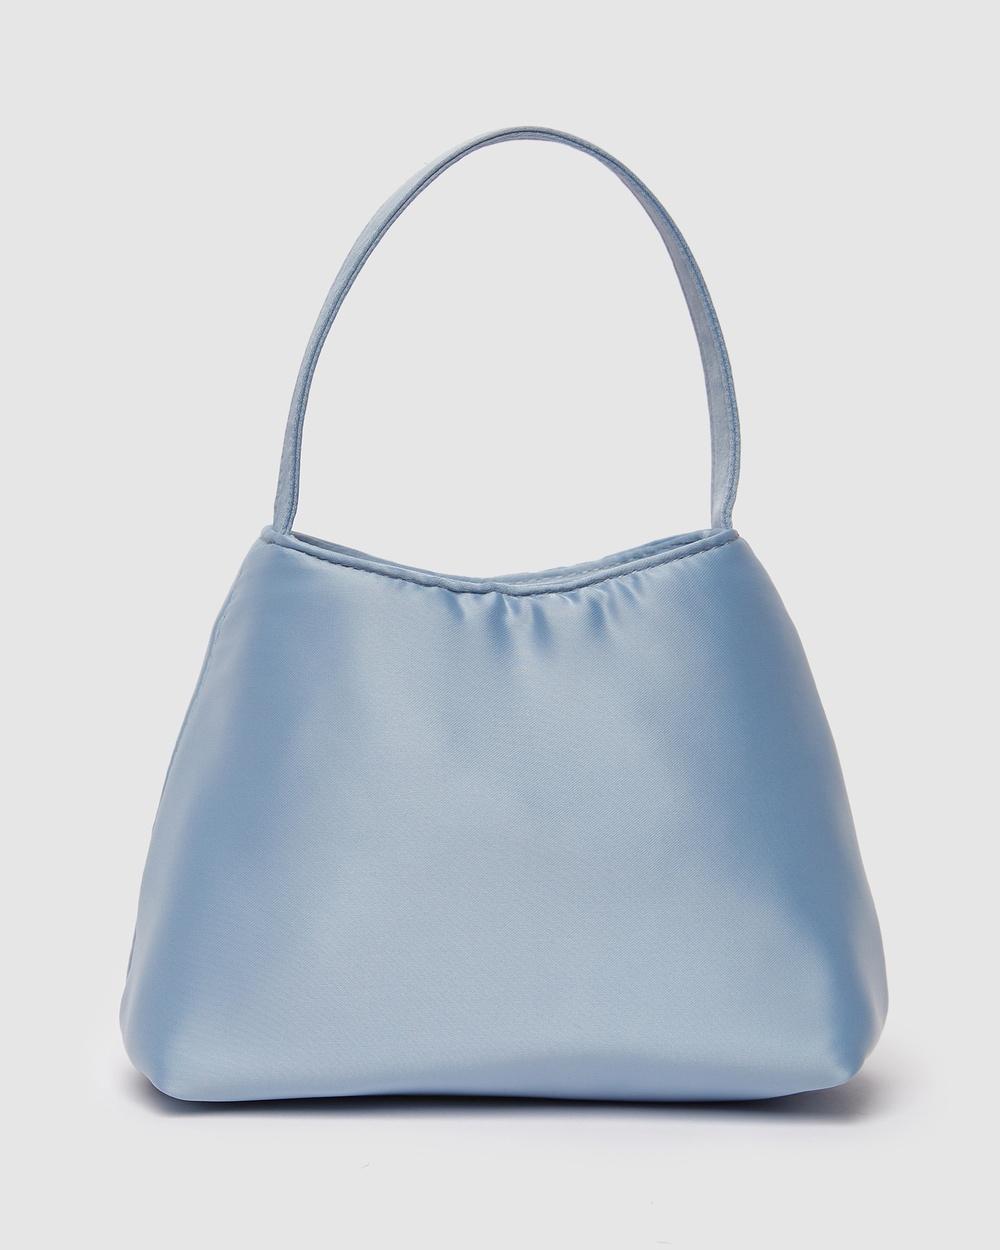 Brie Leon The Mini Chloe Bag Satin Handbags Blue Handbags Australia